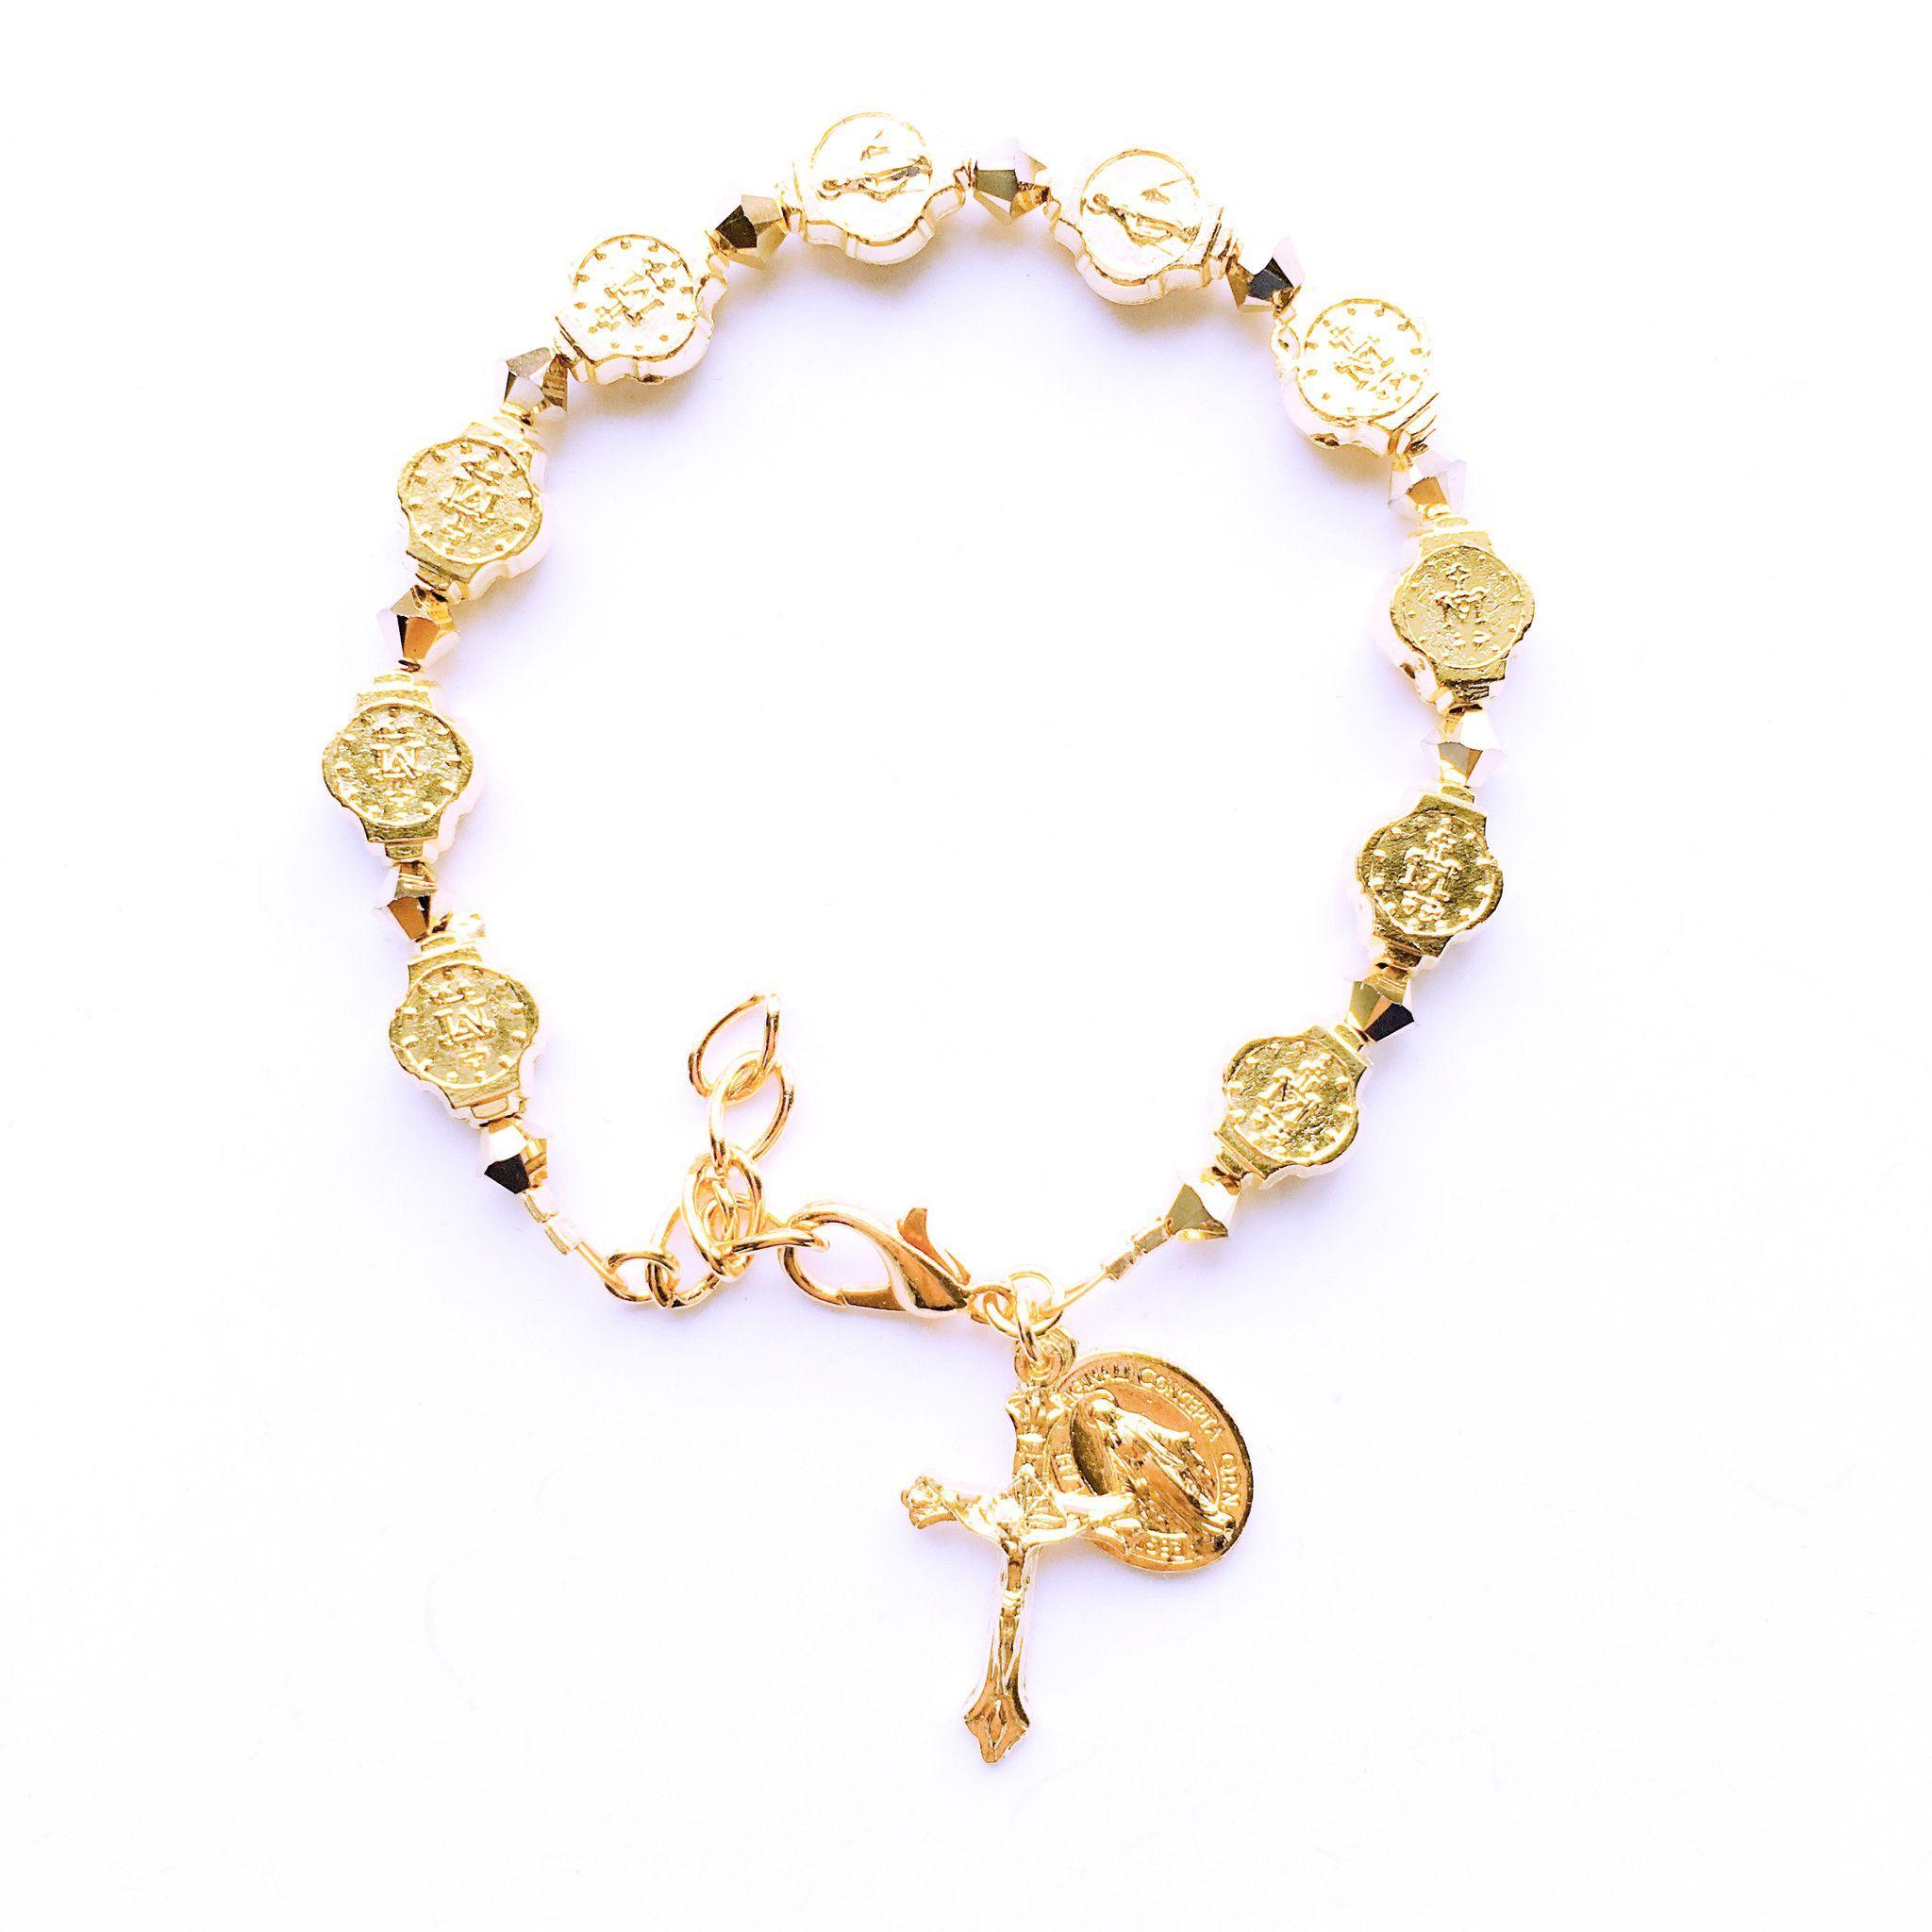 Gold miraculous medal charm bracelet wswarovski elements jewelry